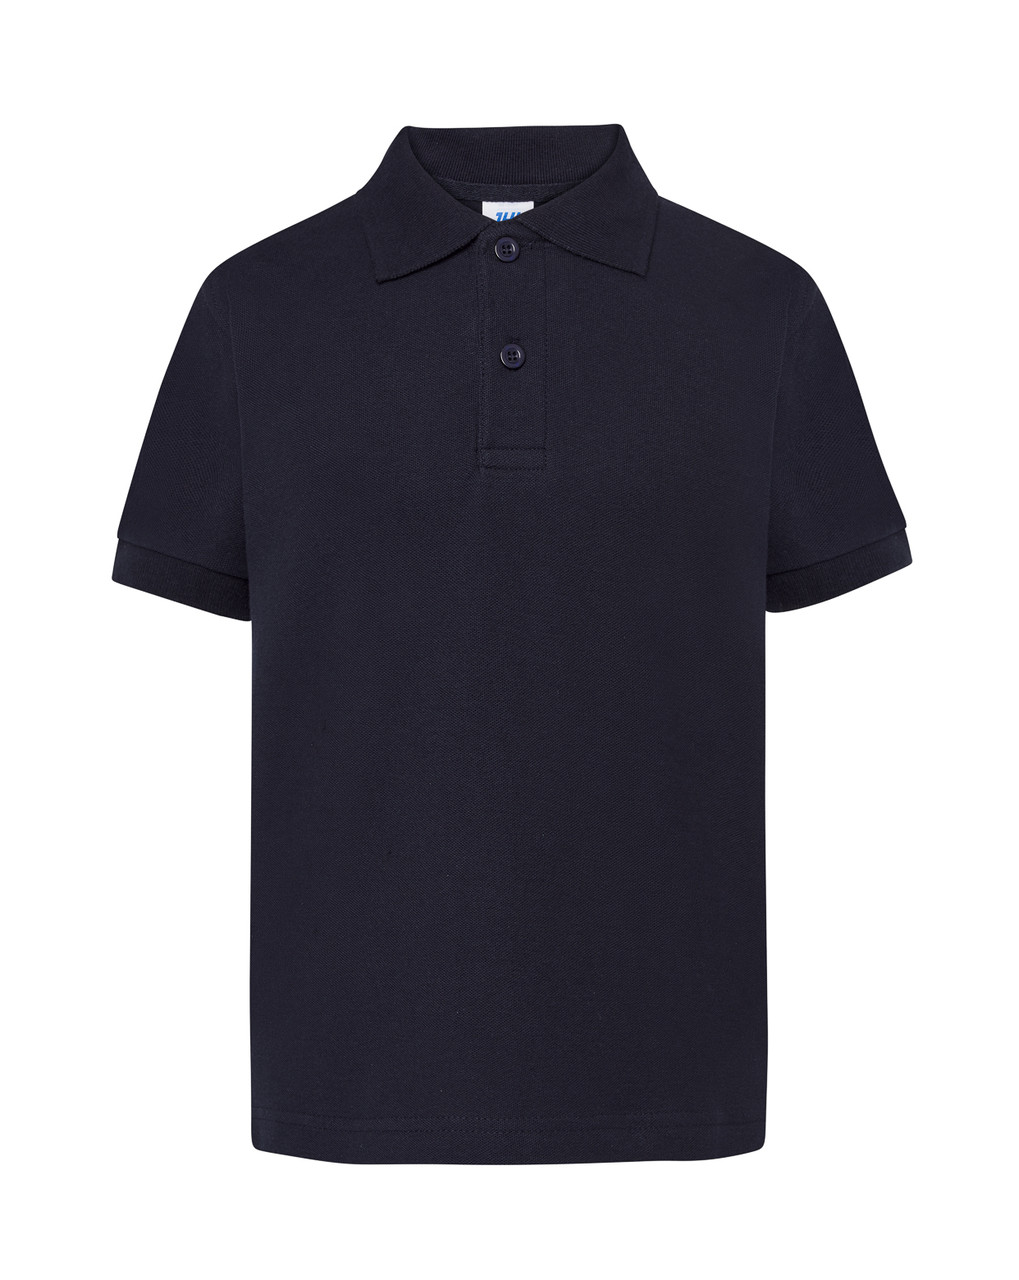 Детская футболка-поло JHK KID POLO цвет темно-синий (NY)